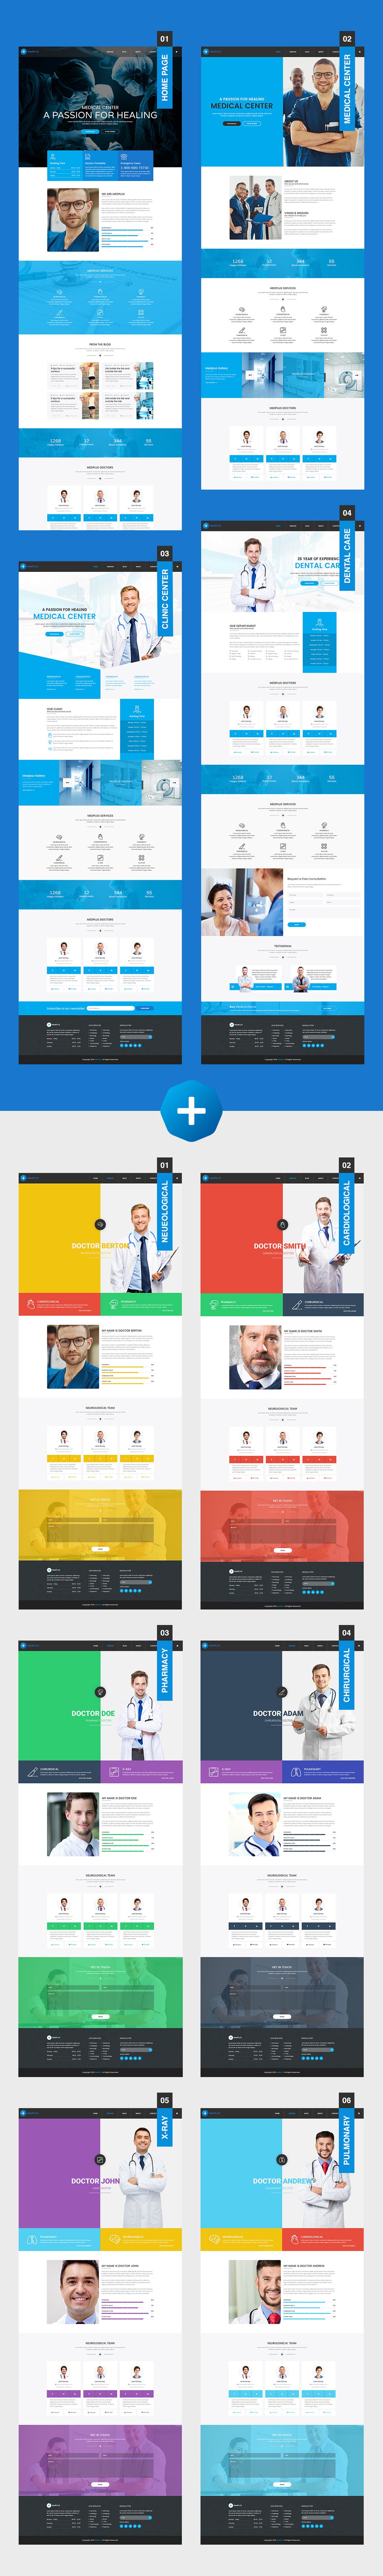 MedPlus – Medical & Health WordPress Theme - 1